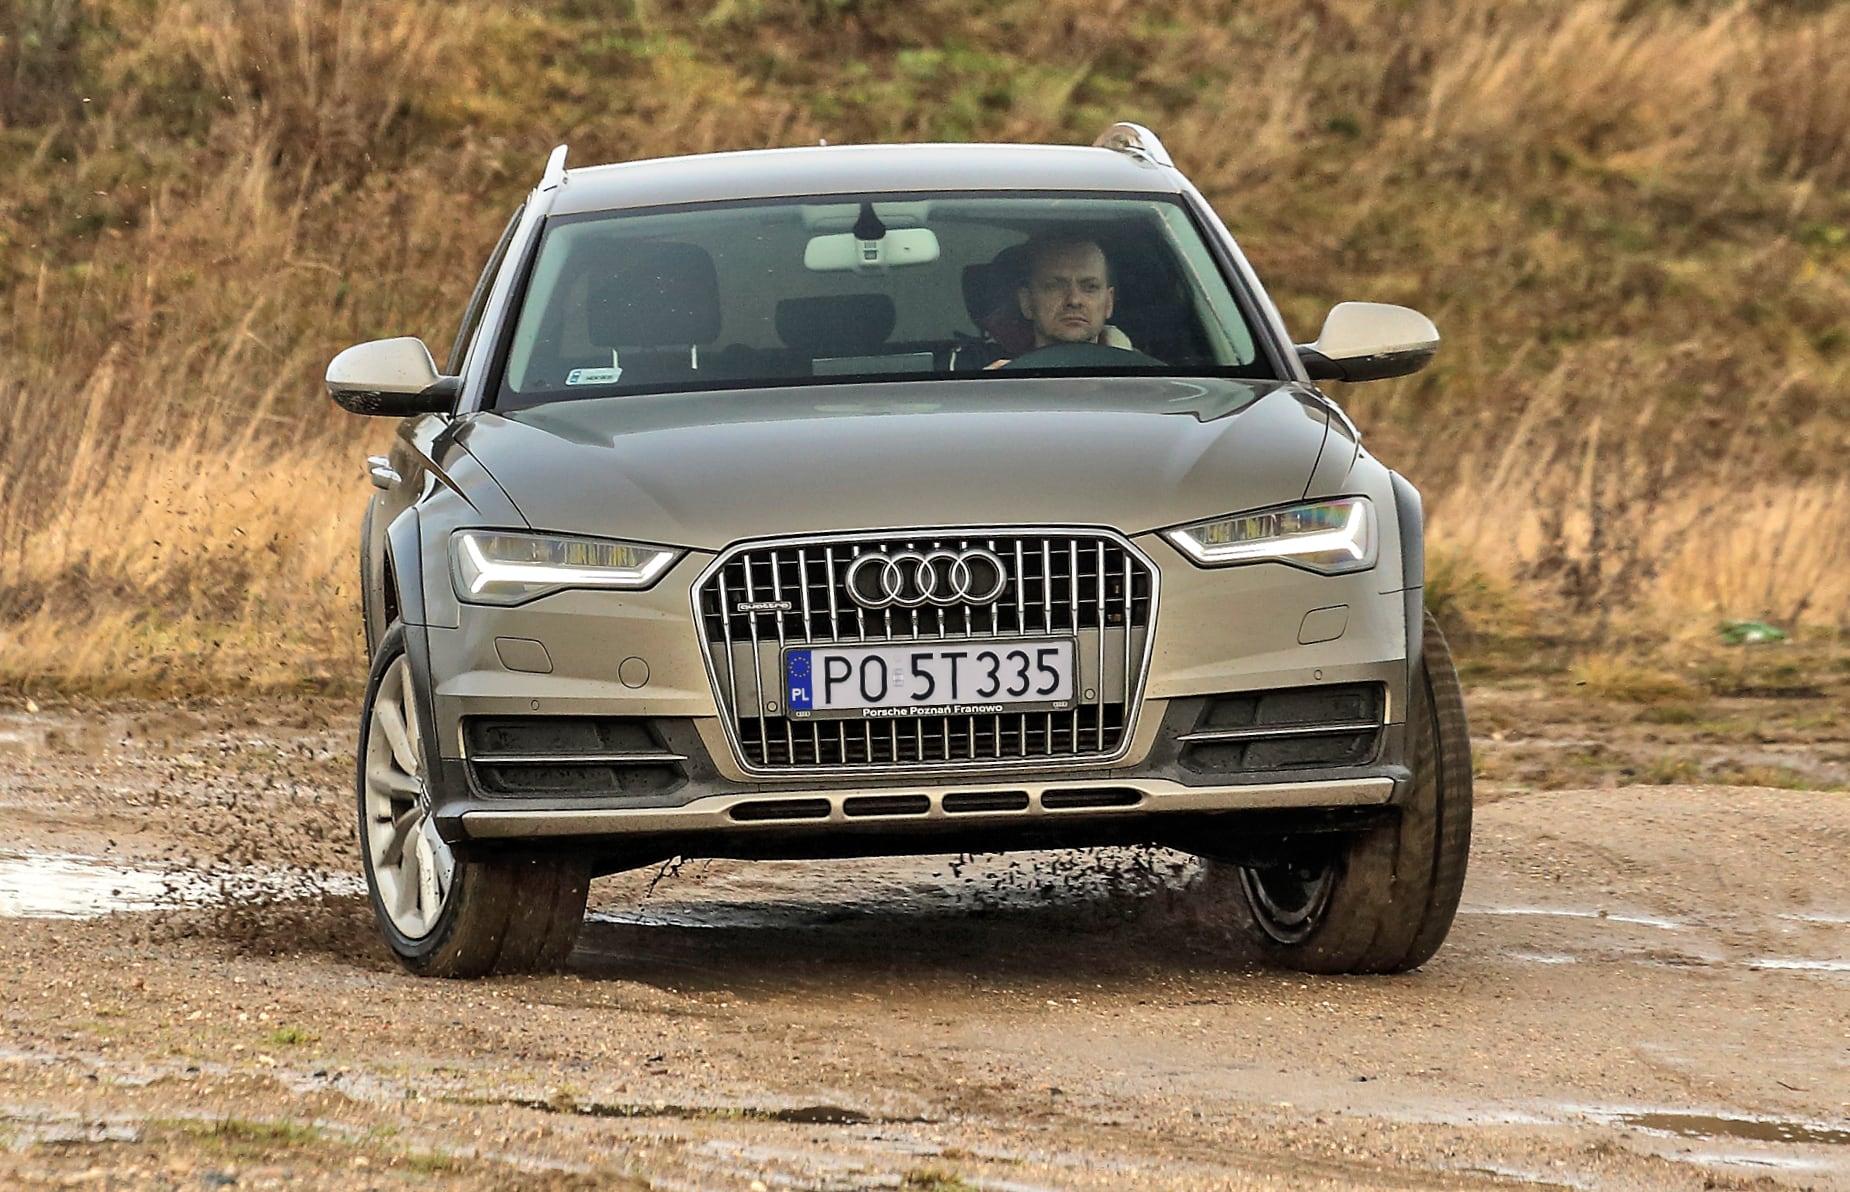 Audi A6 (C7) Allroad 3.0 TDI przód wruchu naszutrze